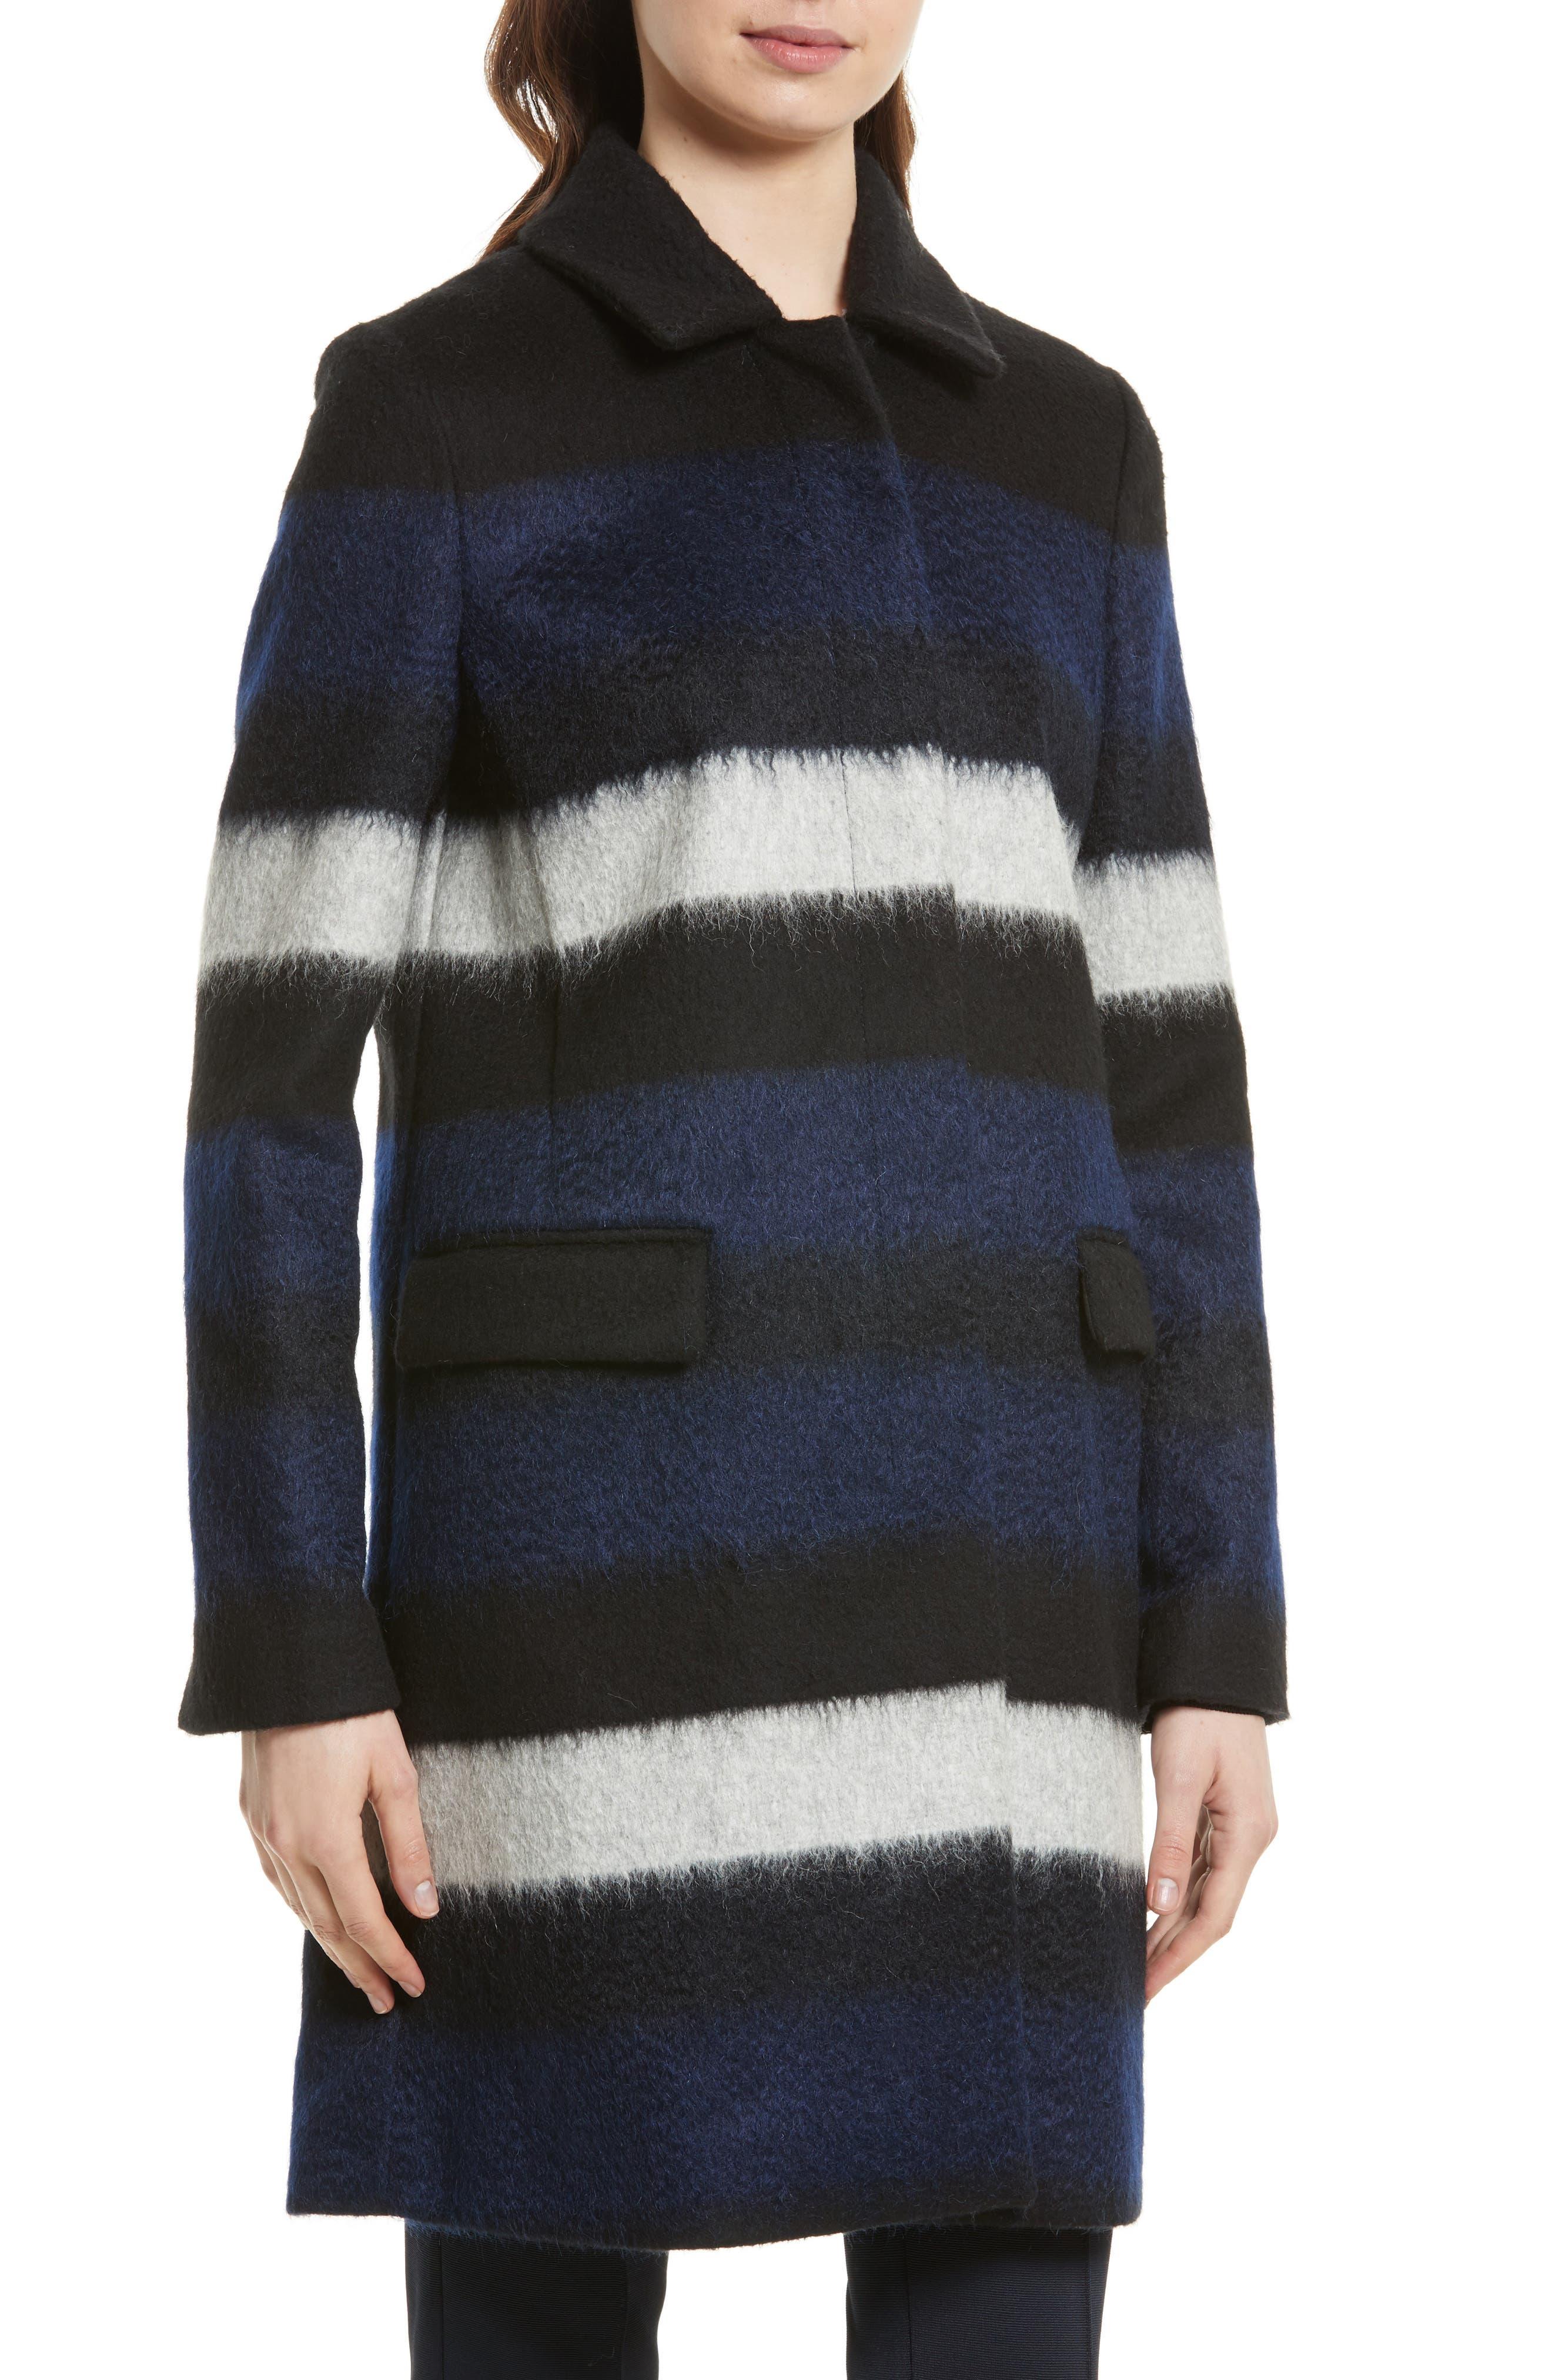 DIANE VON FURSTENBERG,                             Stripe Wool Blend Coat,                             Alternate thumbnail 4, color,                             005